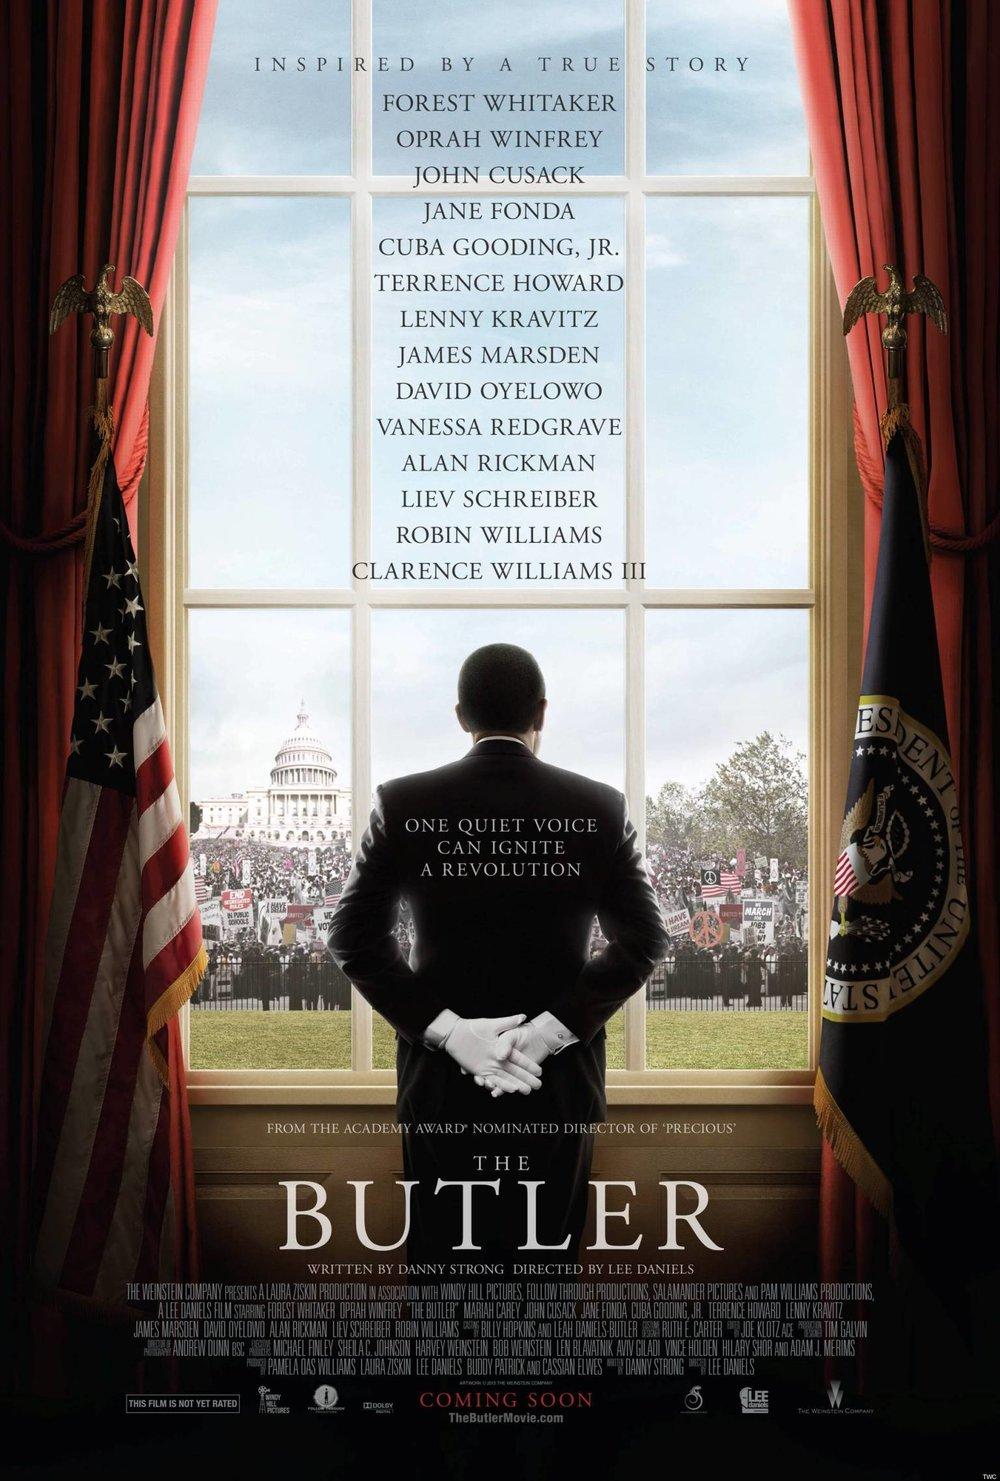 uptown-the-butler-poster.jpg